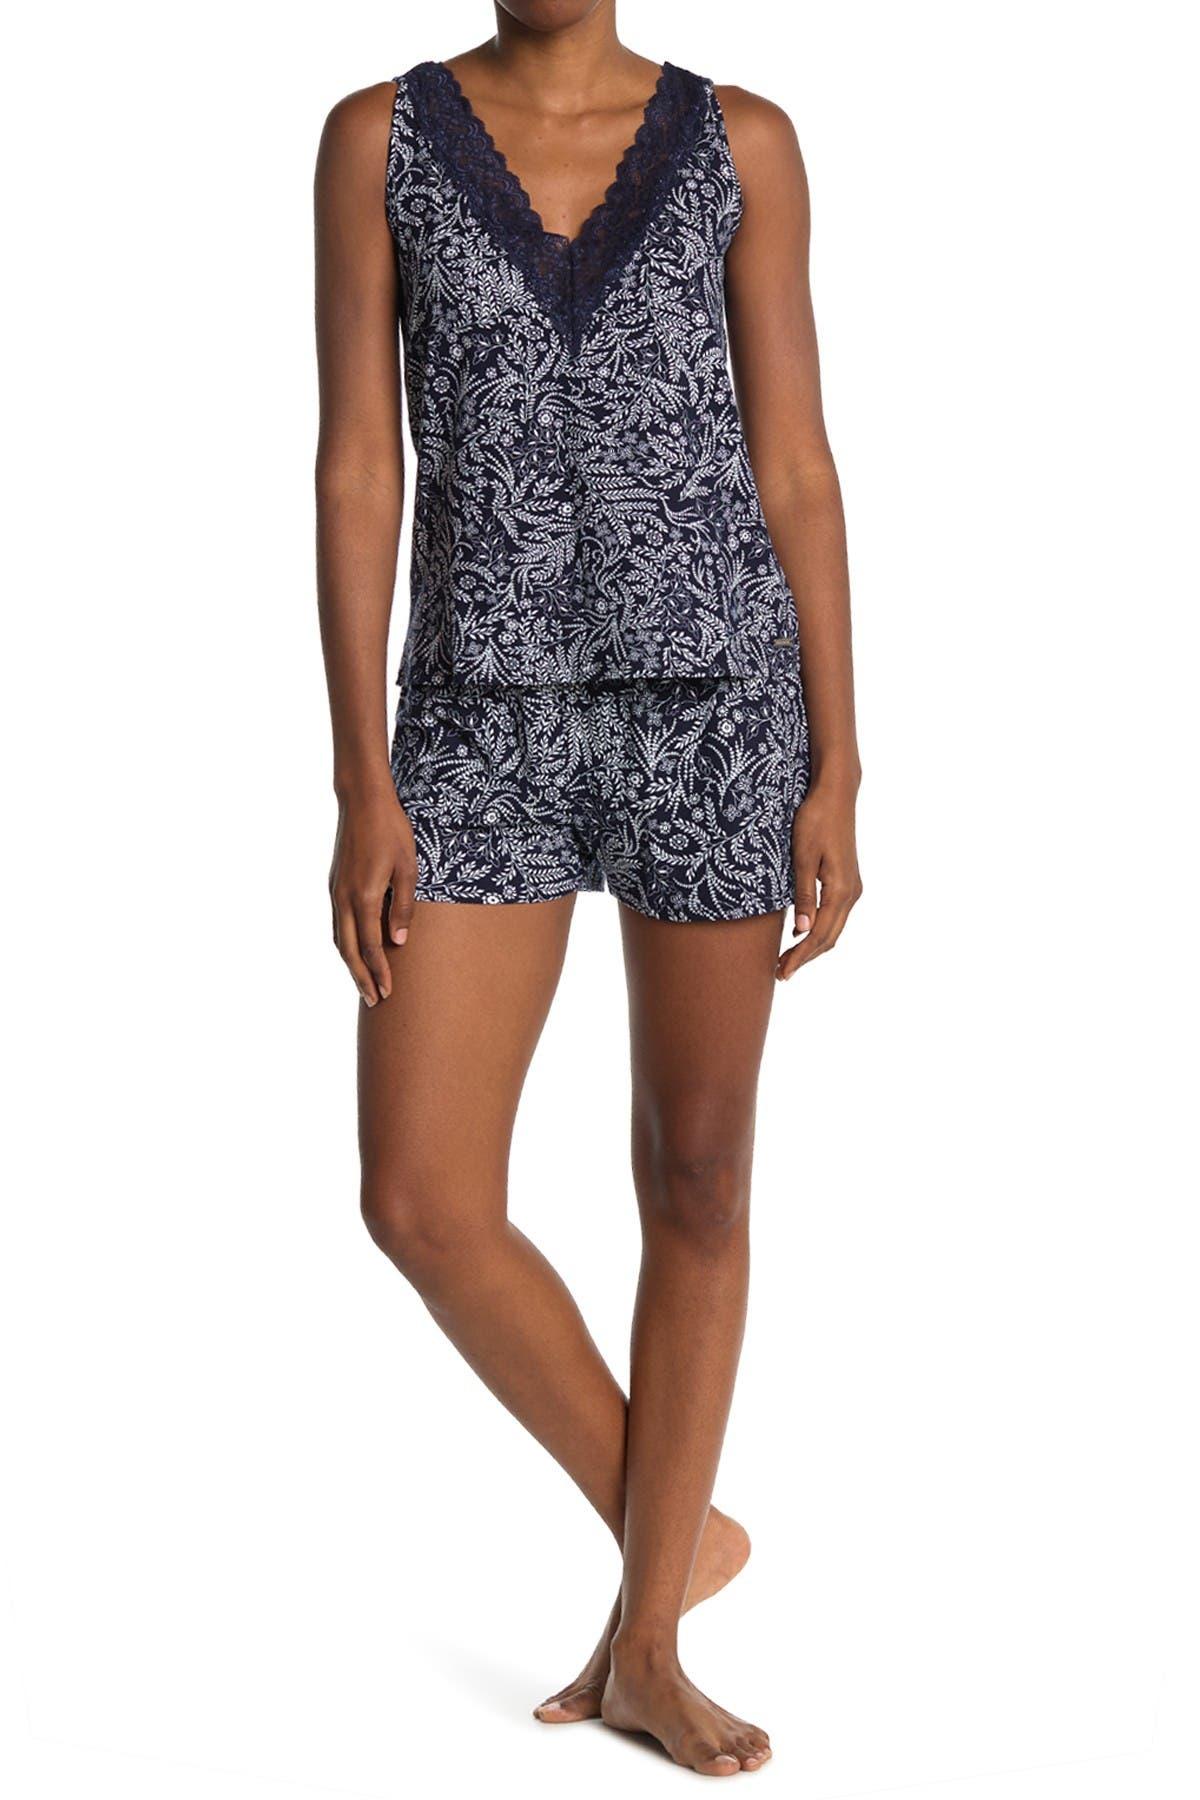 Image of Tahari Lace V-Neck Tank & Shorts Pajama Set